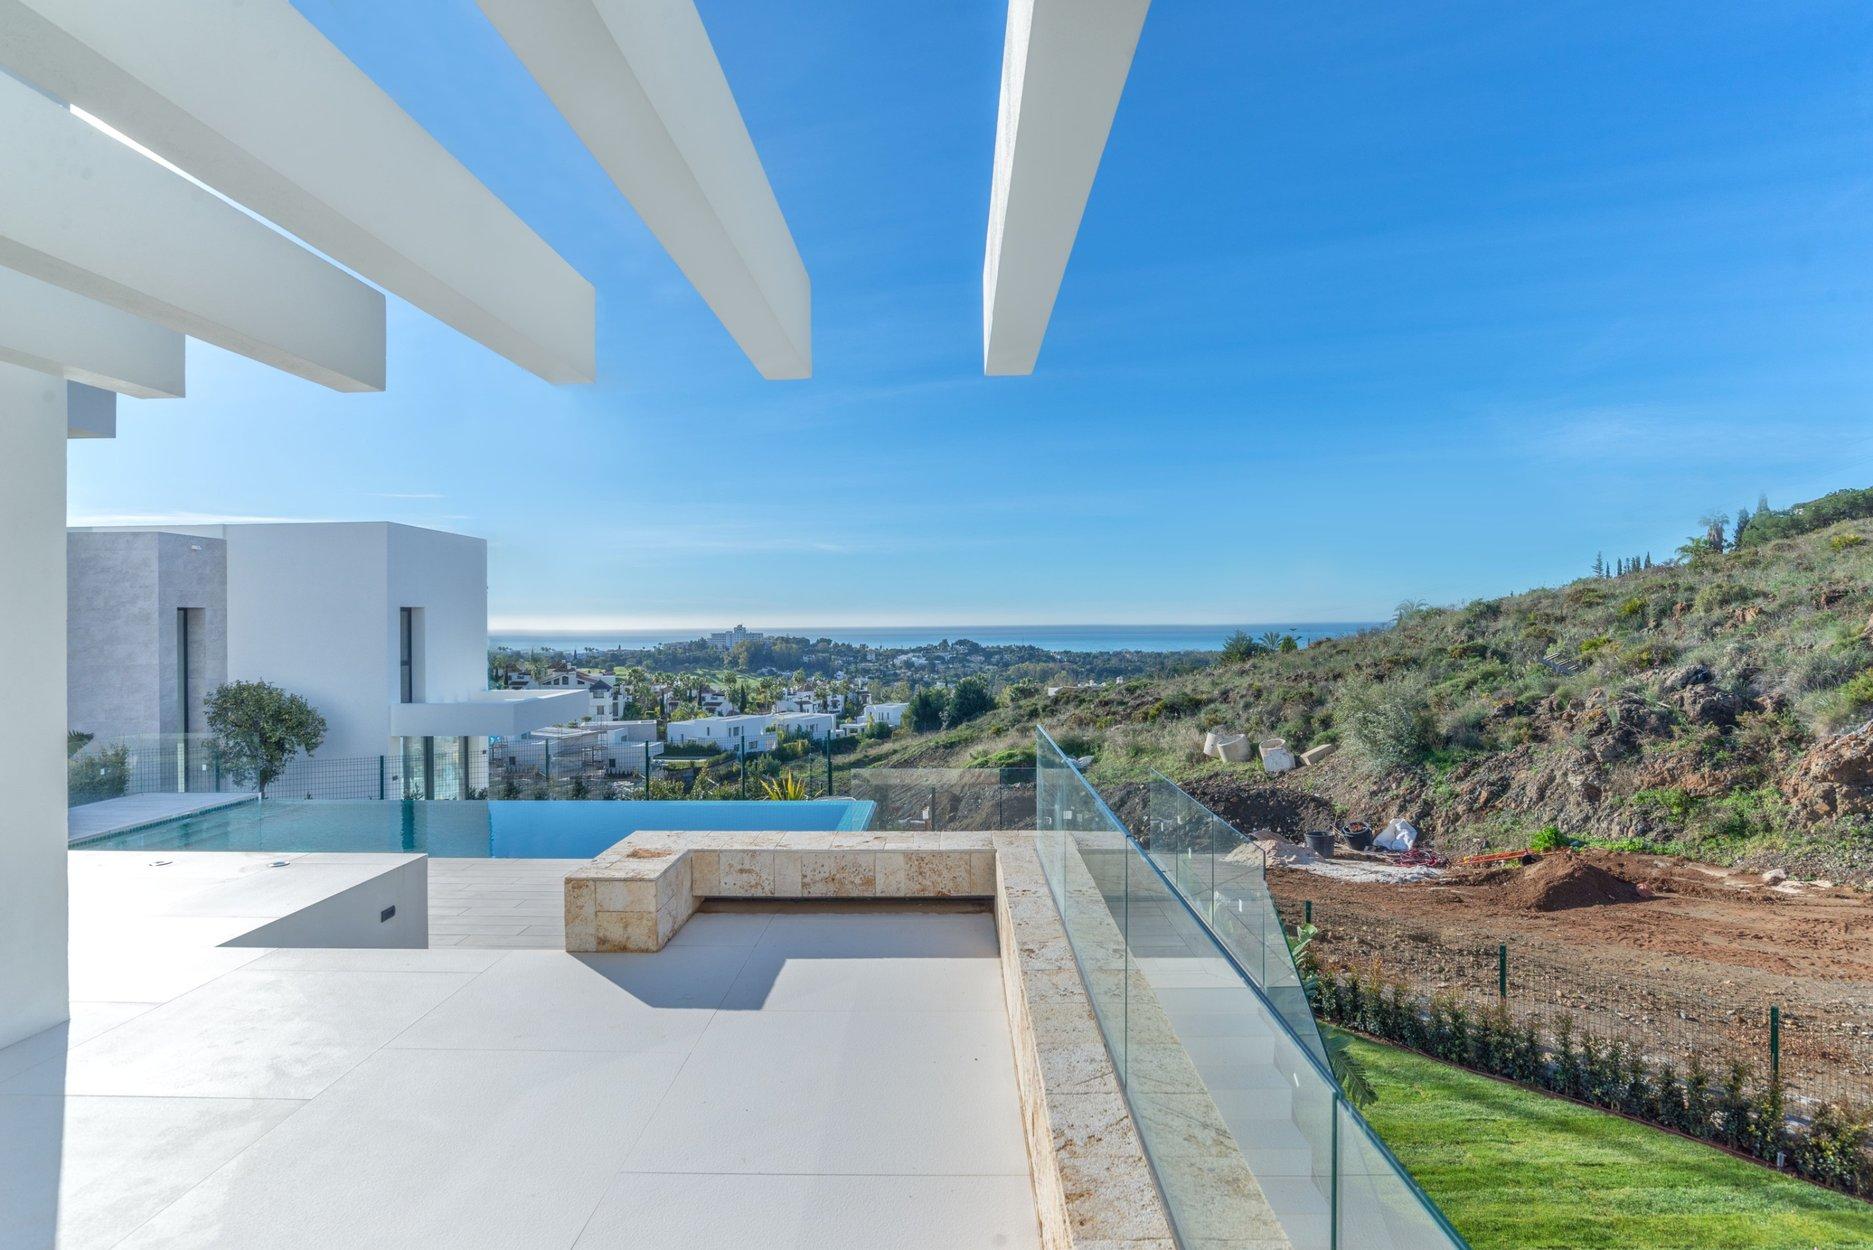 Villa till salu i Estepona, El Paraiso